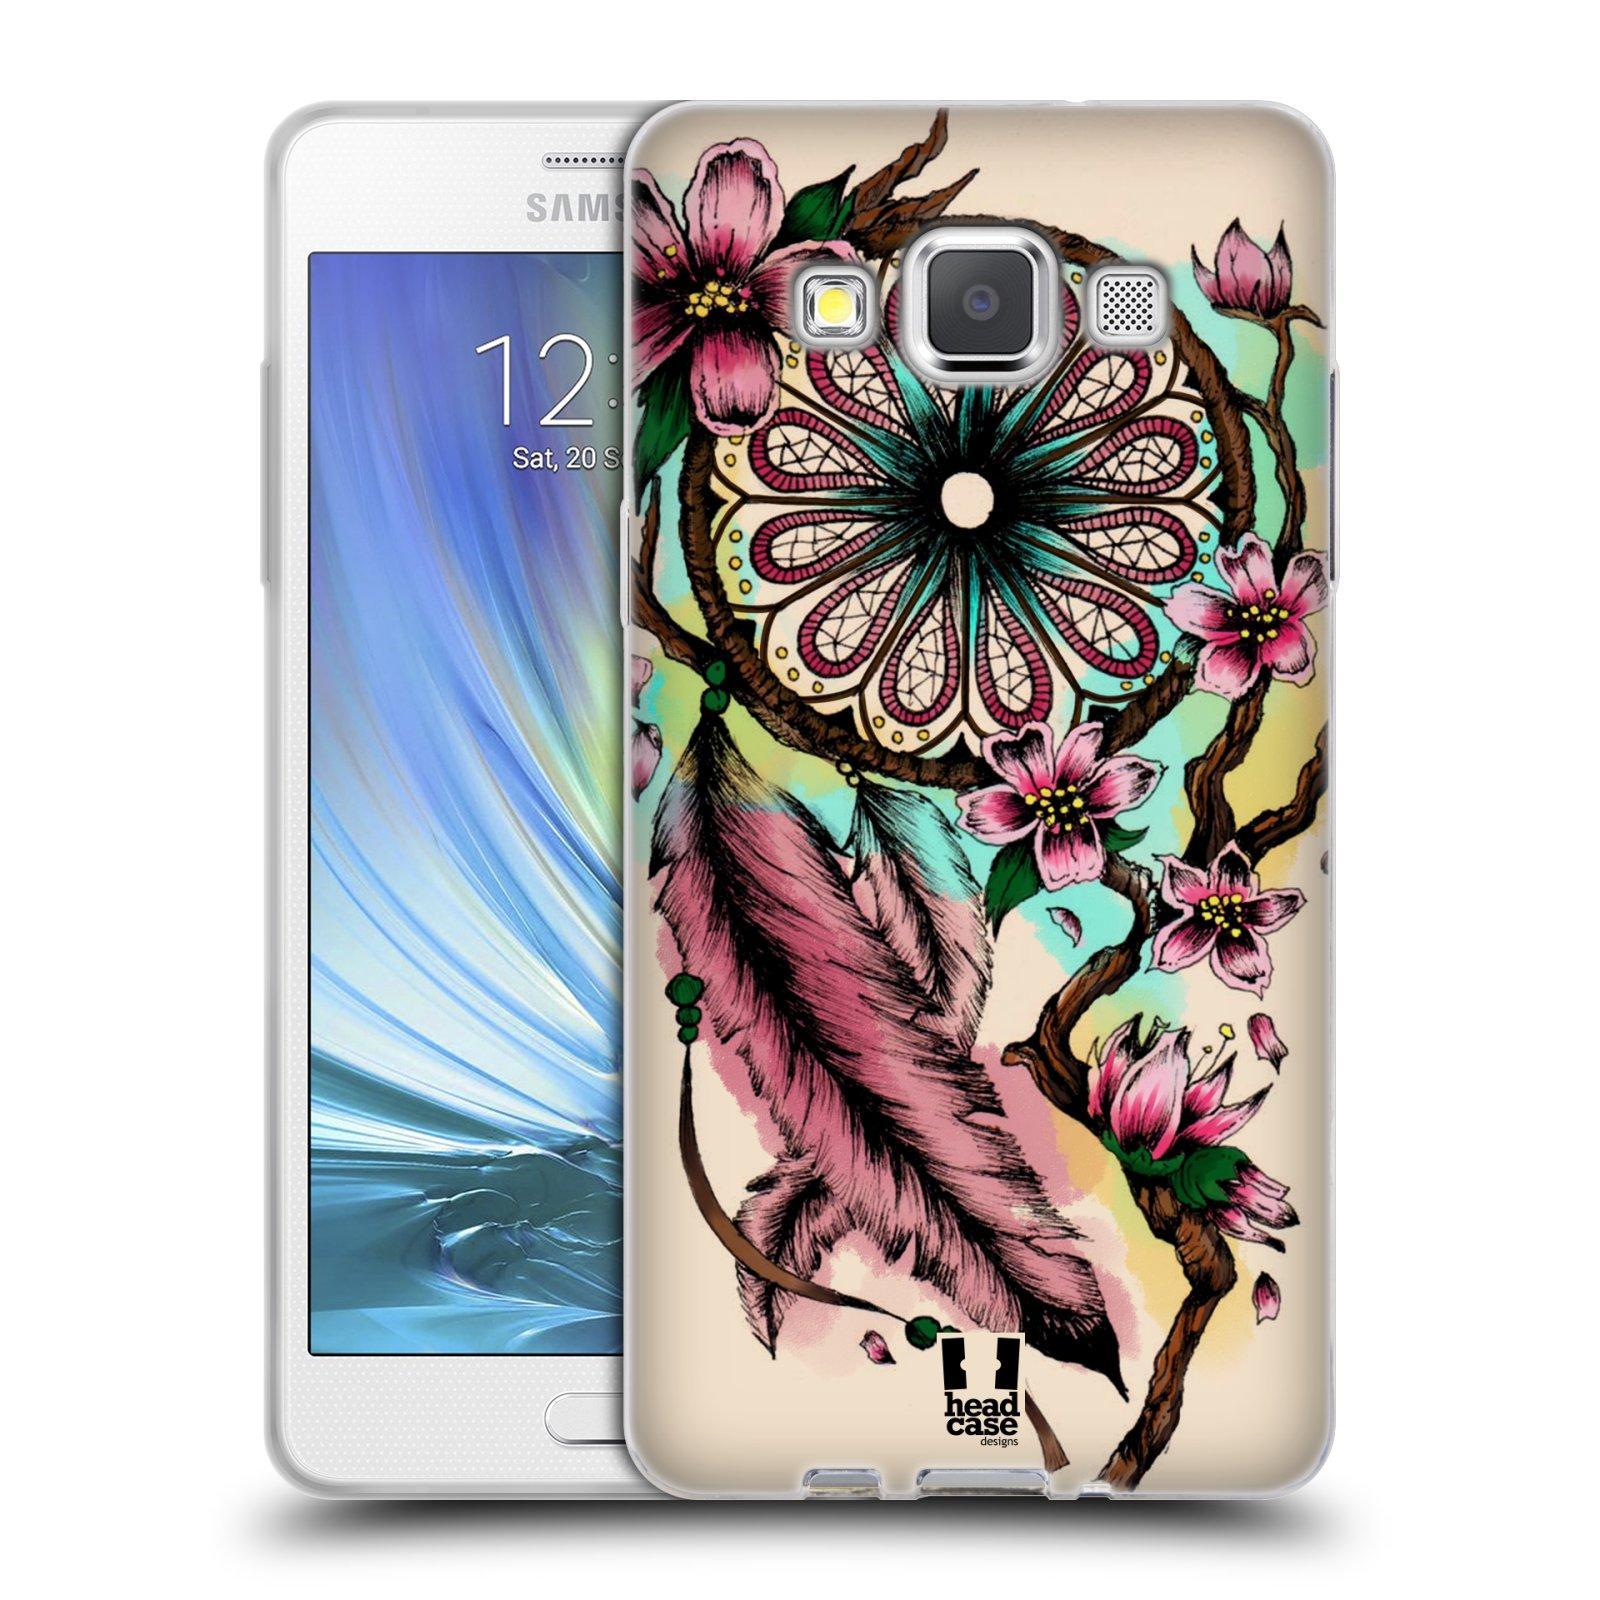 HEAD CASE silikonový obal na mobil Samsung Galaxy A5 vzor Květy lapač snů růžová